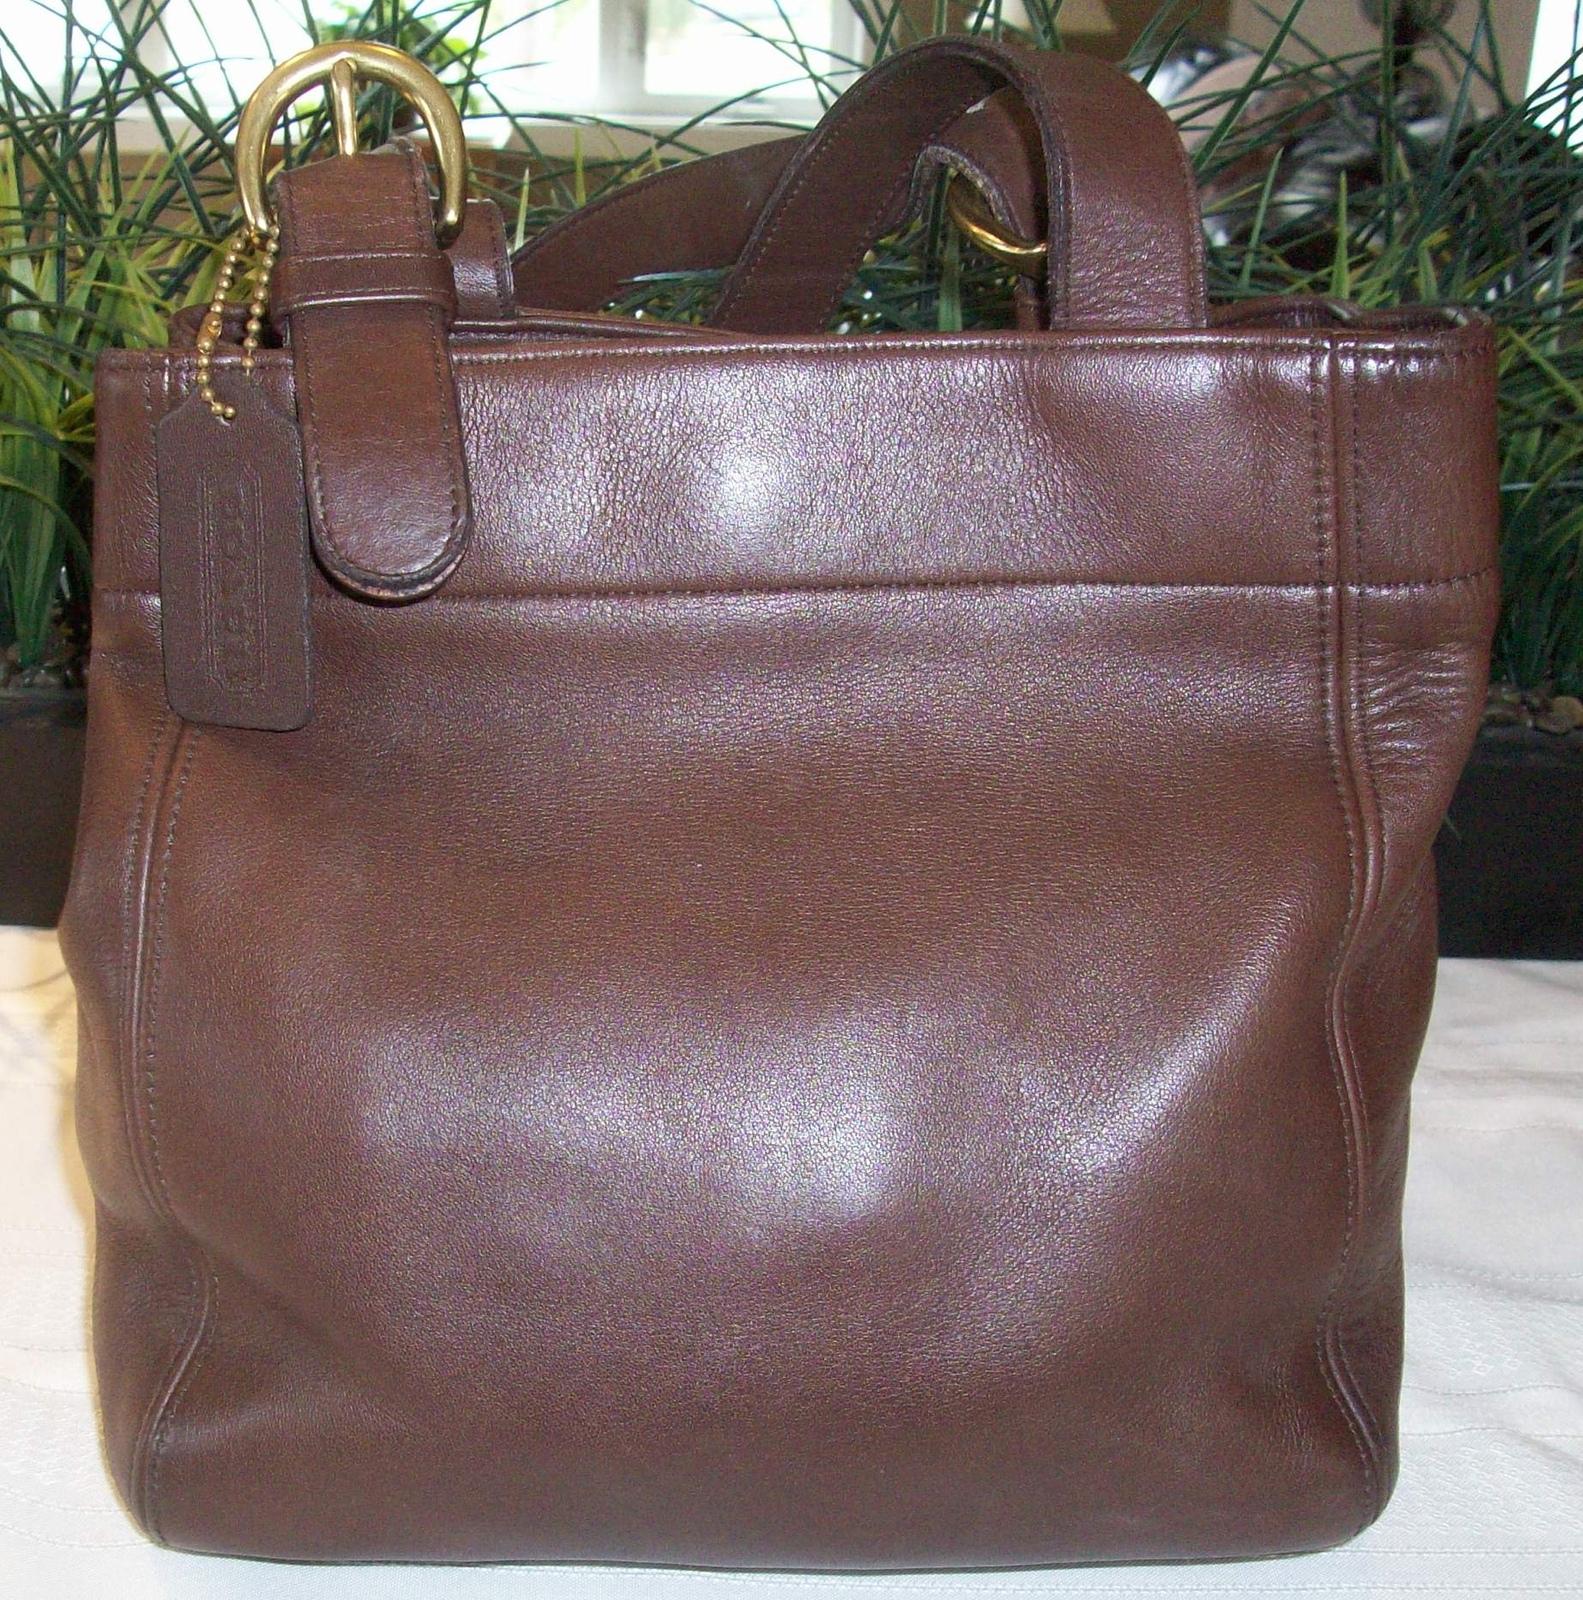 70f232bafe Coach Leather Waverly Shoulder Bag 4157 US and 50 similar items. 100 9823